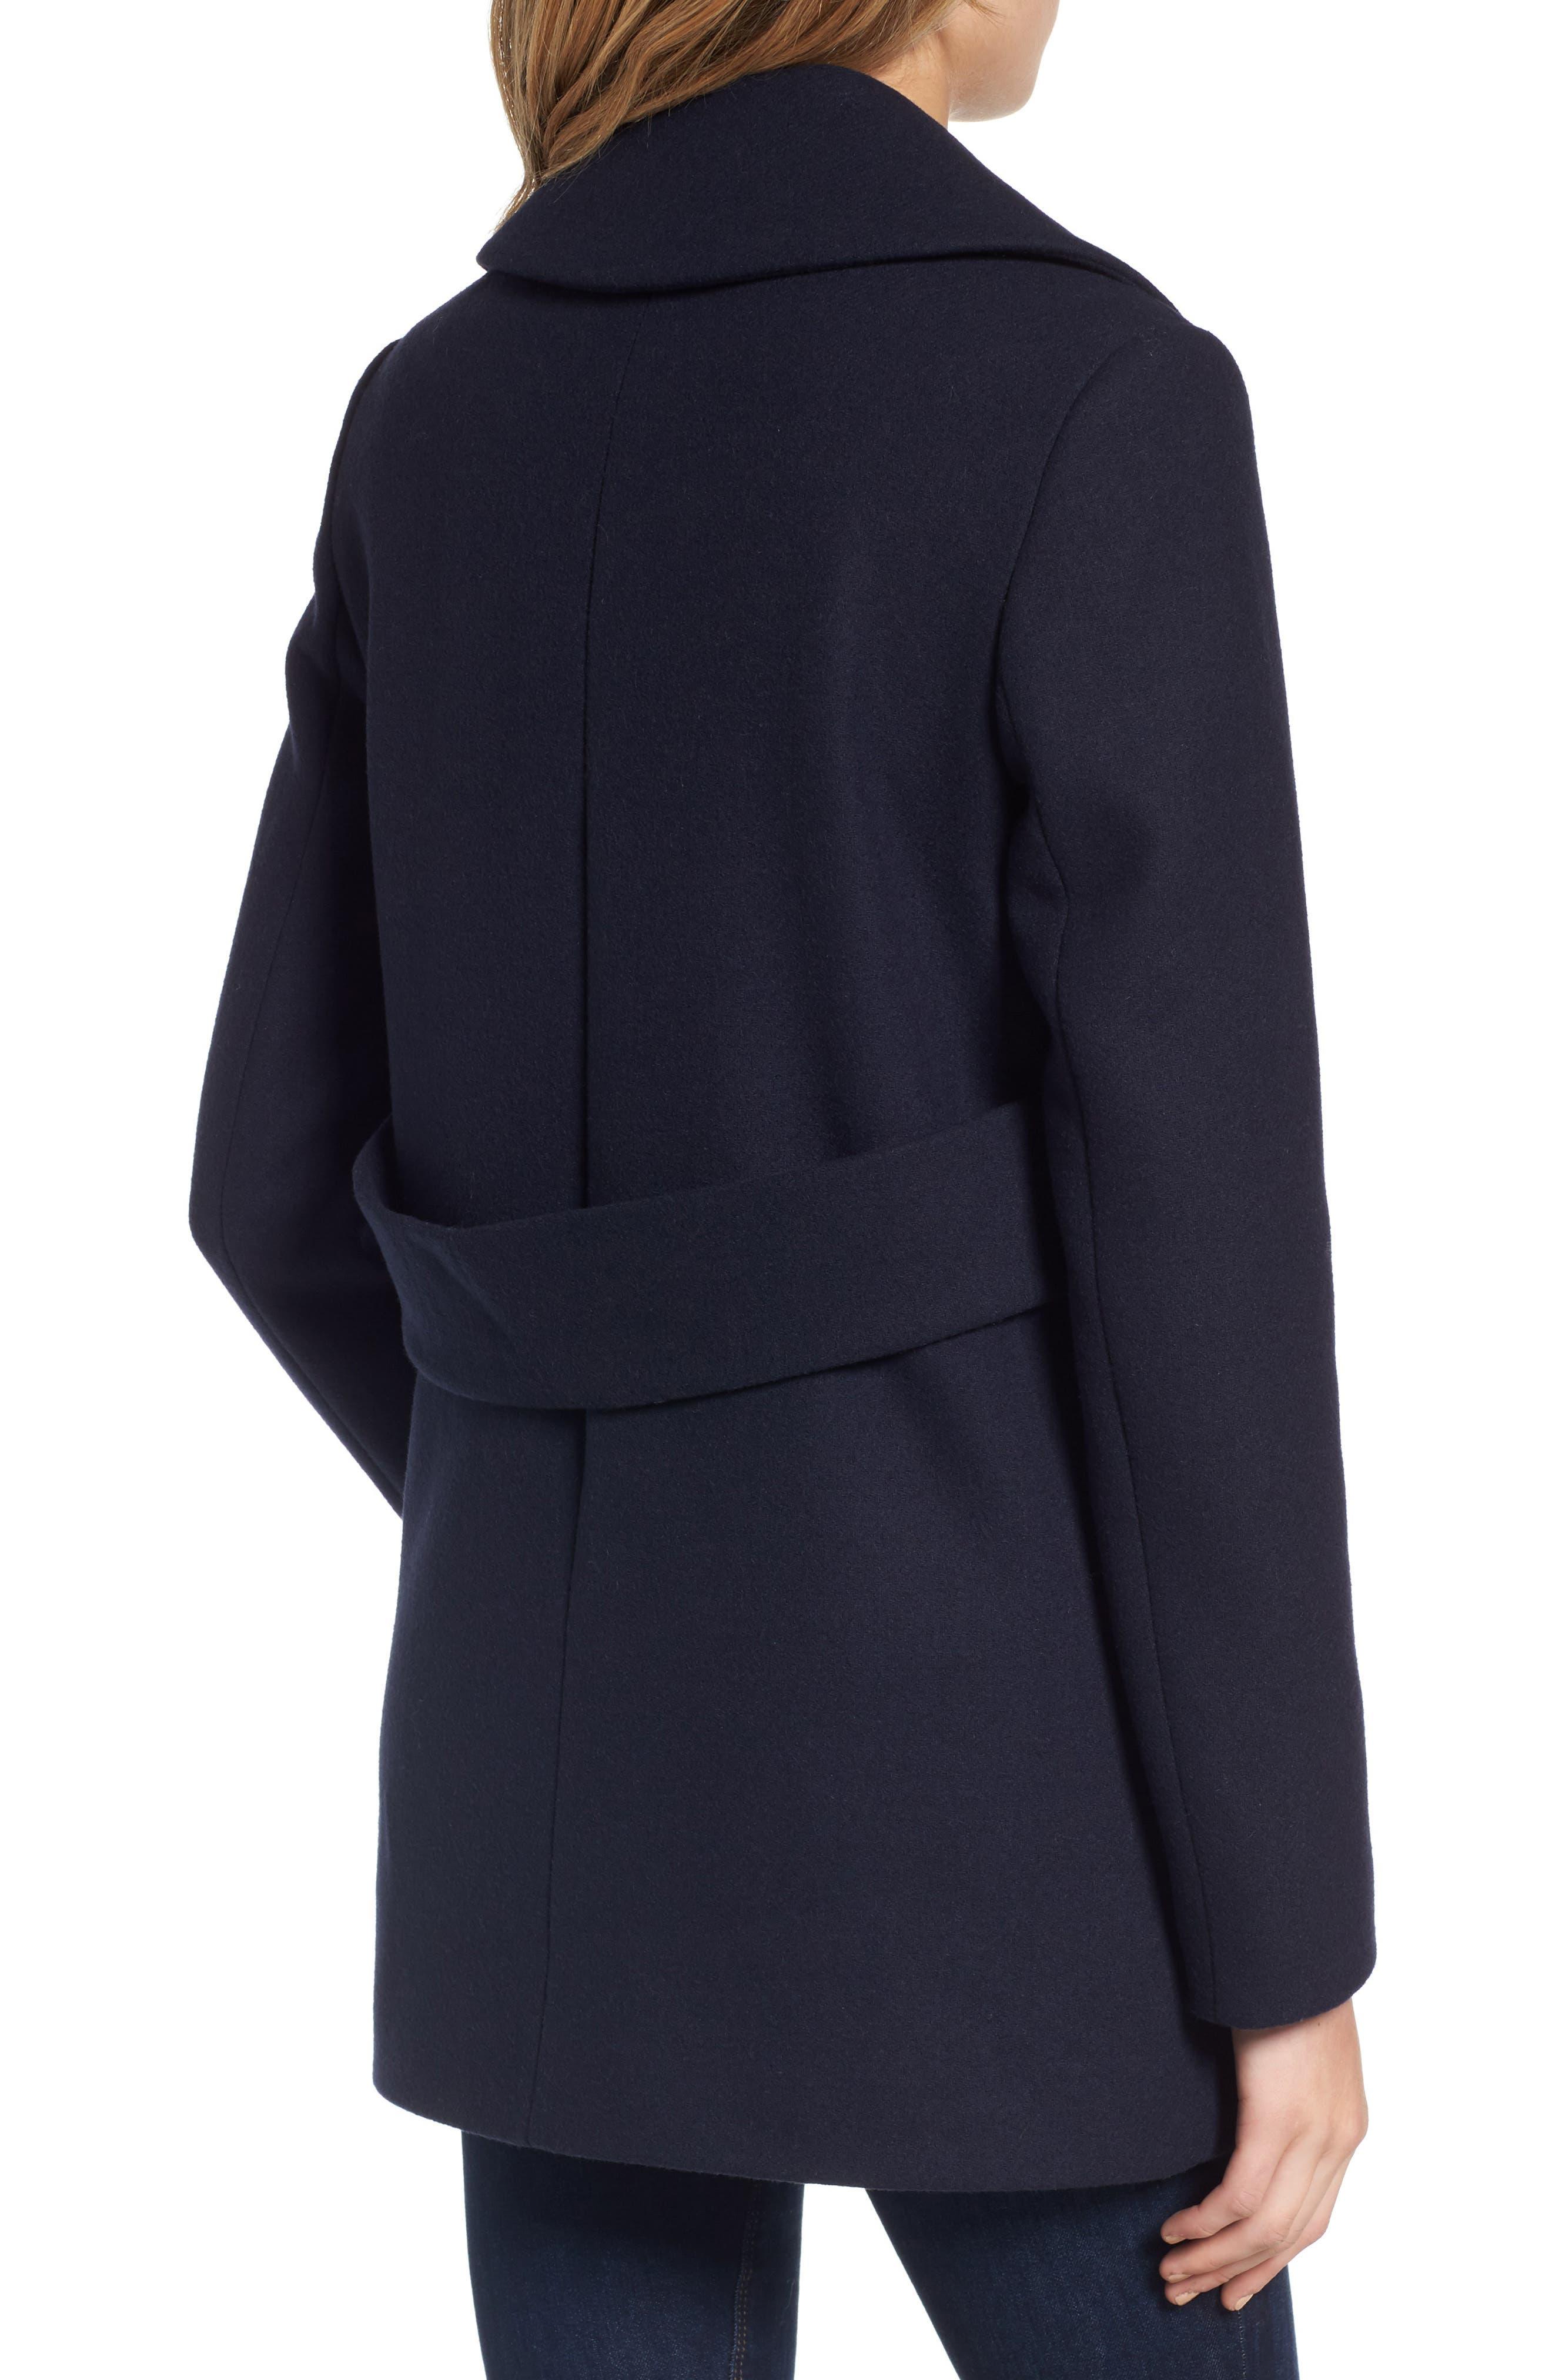 Alternate Image 2  - French Connection Back Belt Wool Blend Peacoat